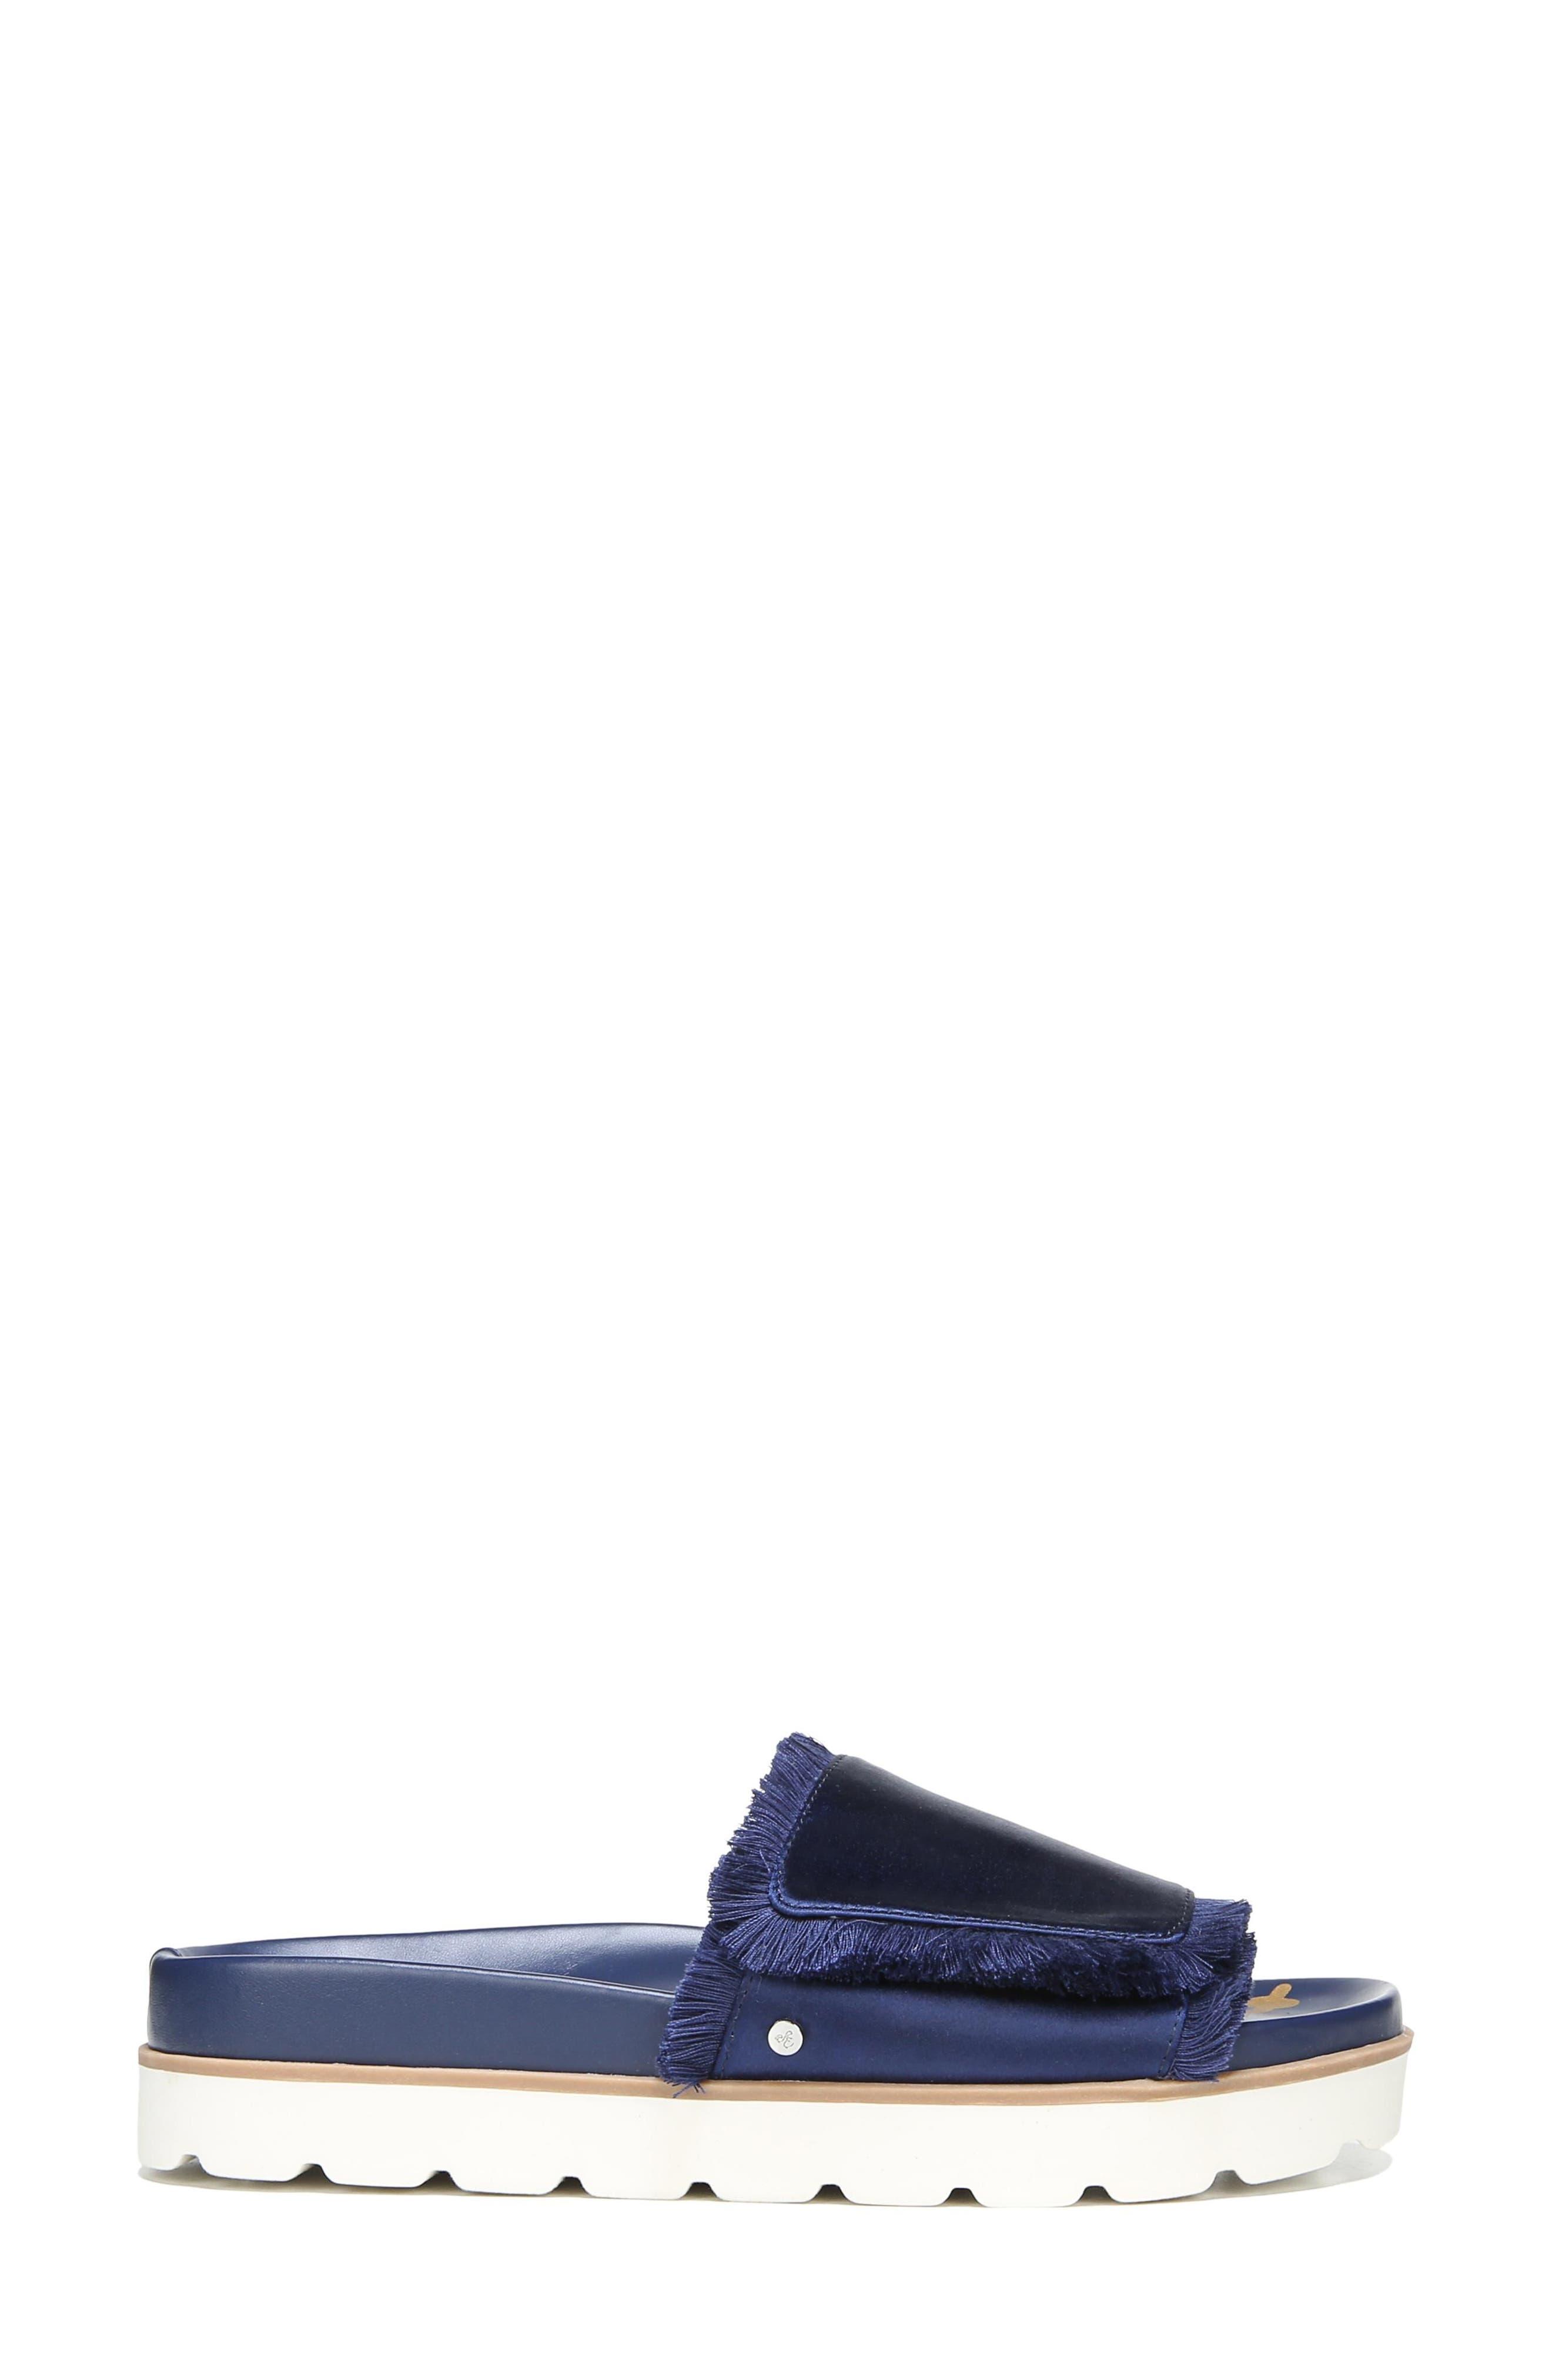 Mares Slide Sandal,                             Alternate thumbnail 3, color,                             Poseidon Blue Satin